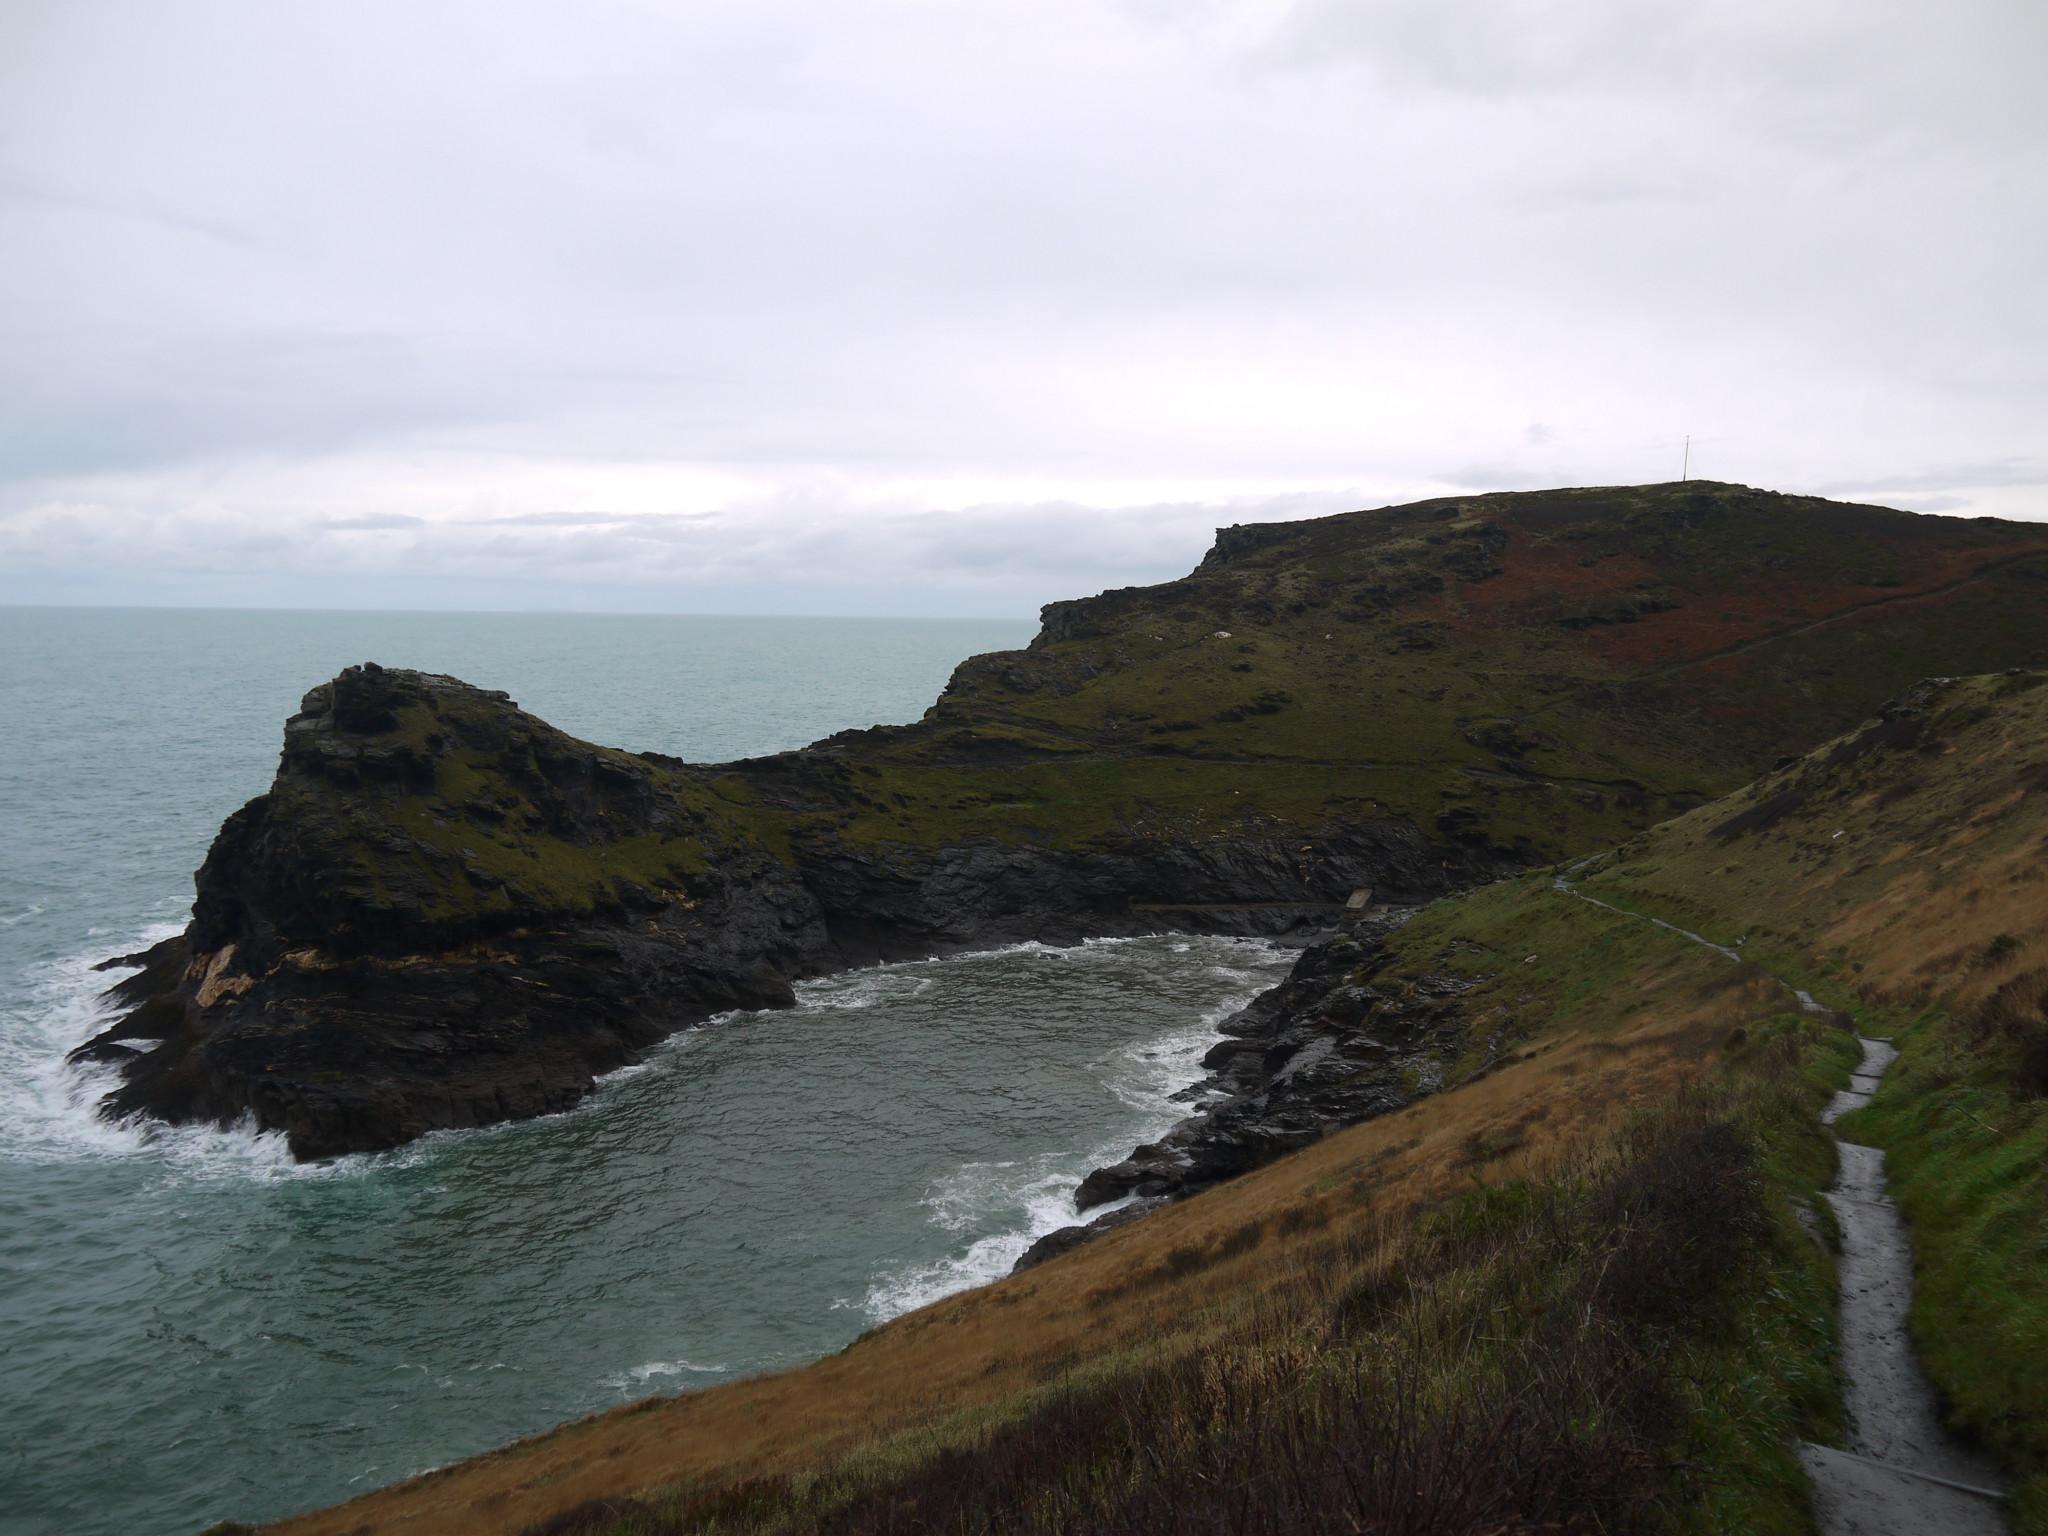 ViewRanger - Boscastle Coast and Rocky Valley - Walking